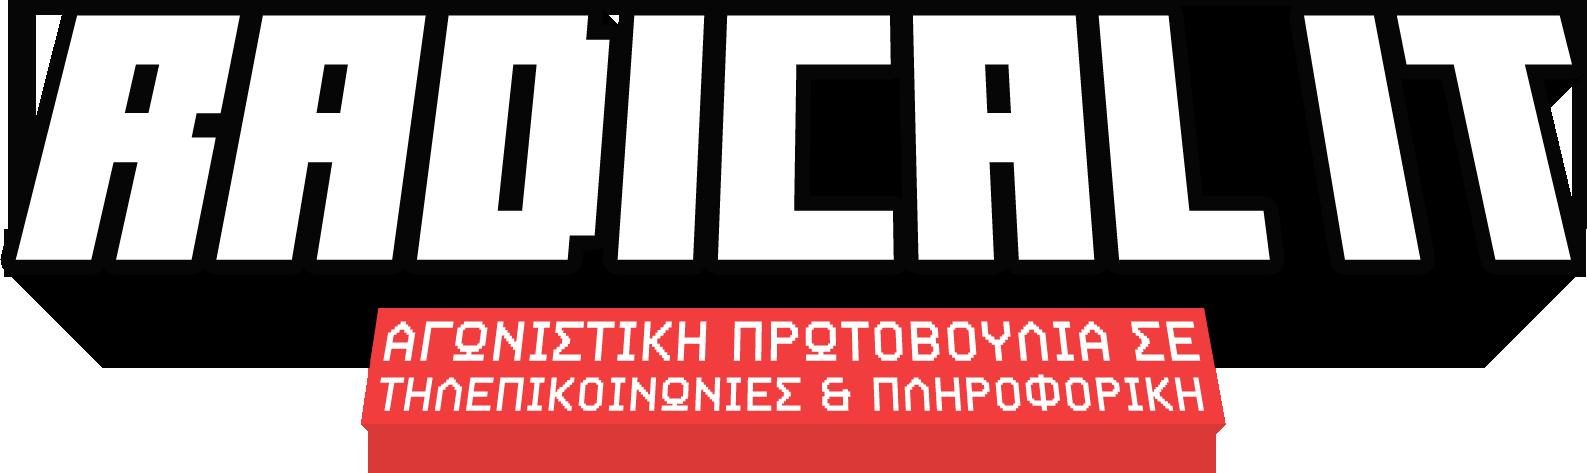 Radical I.T.